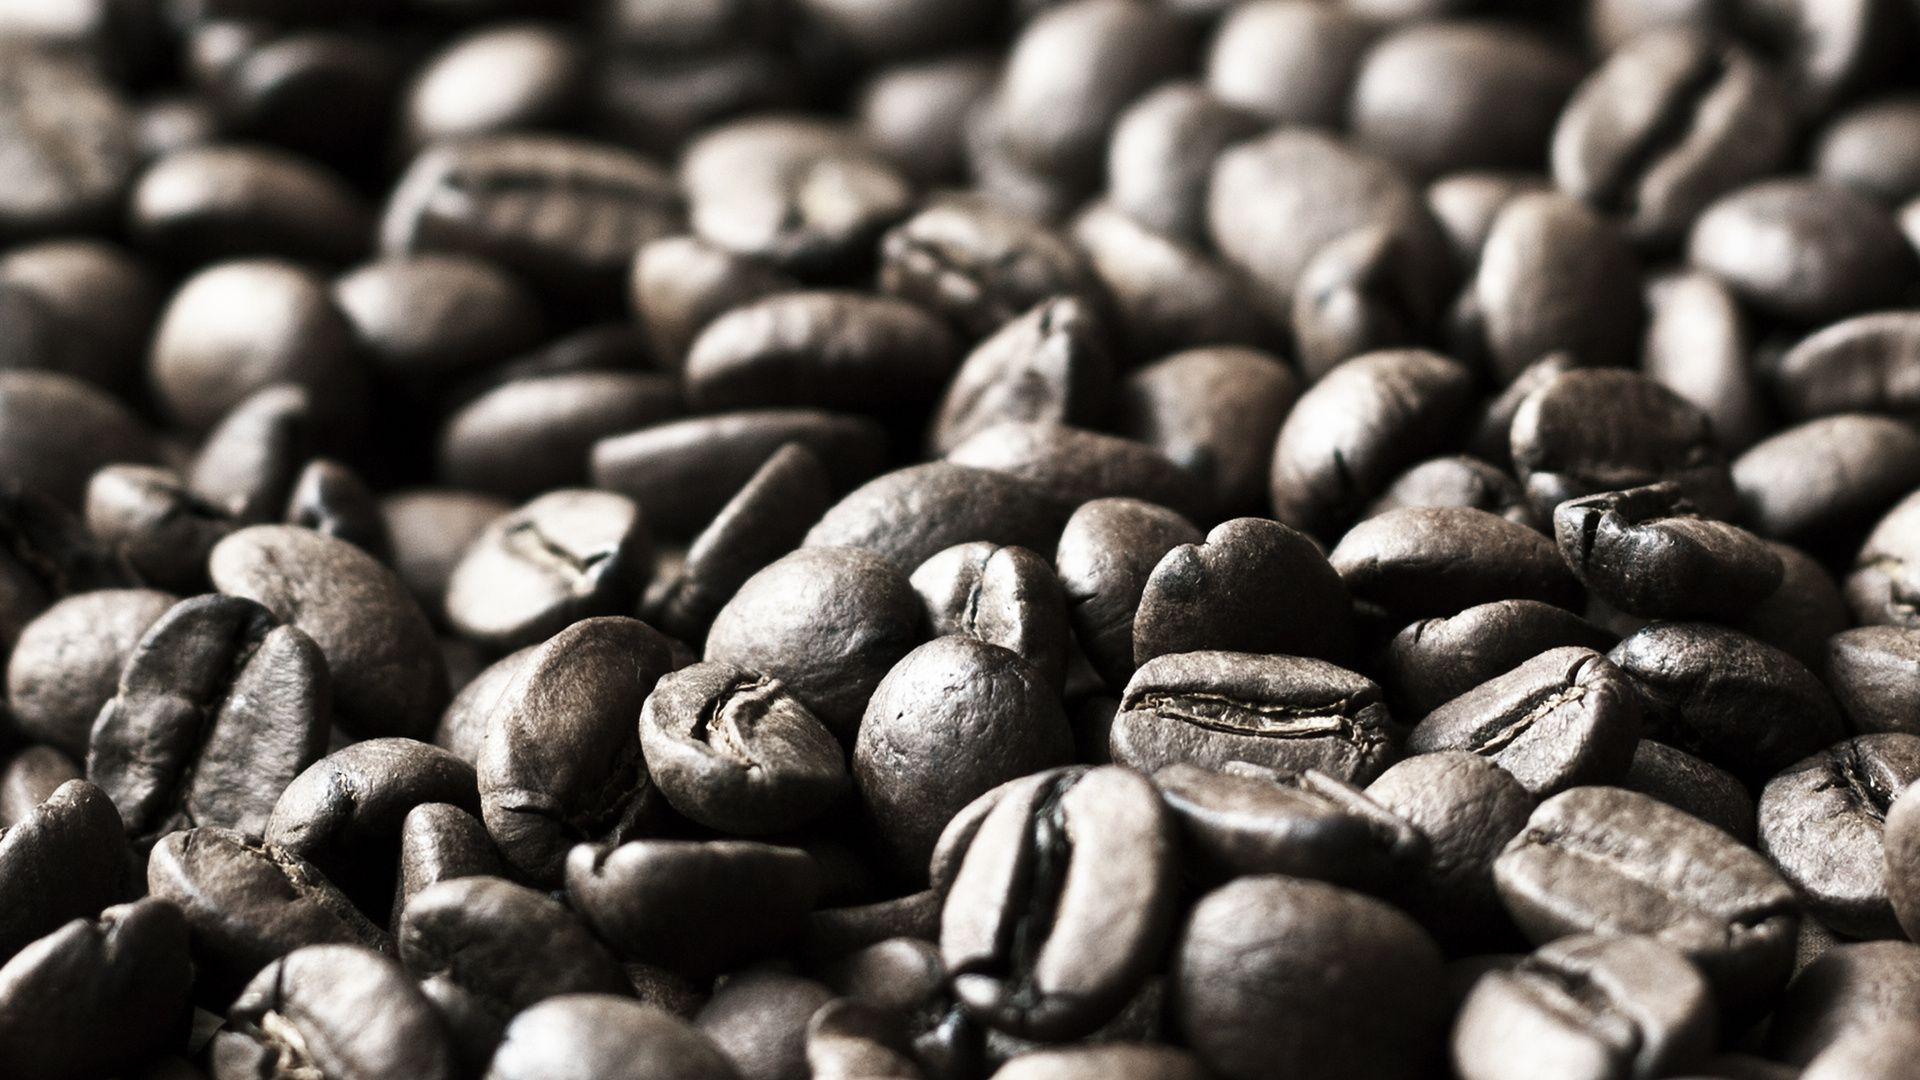 Coffee Beans 1080p HD Desktop Wallpaper  Coffee The